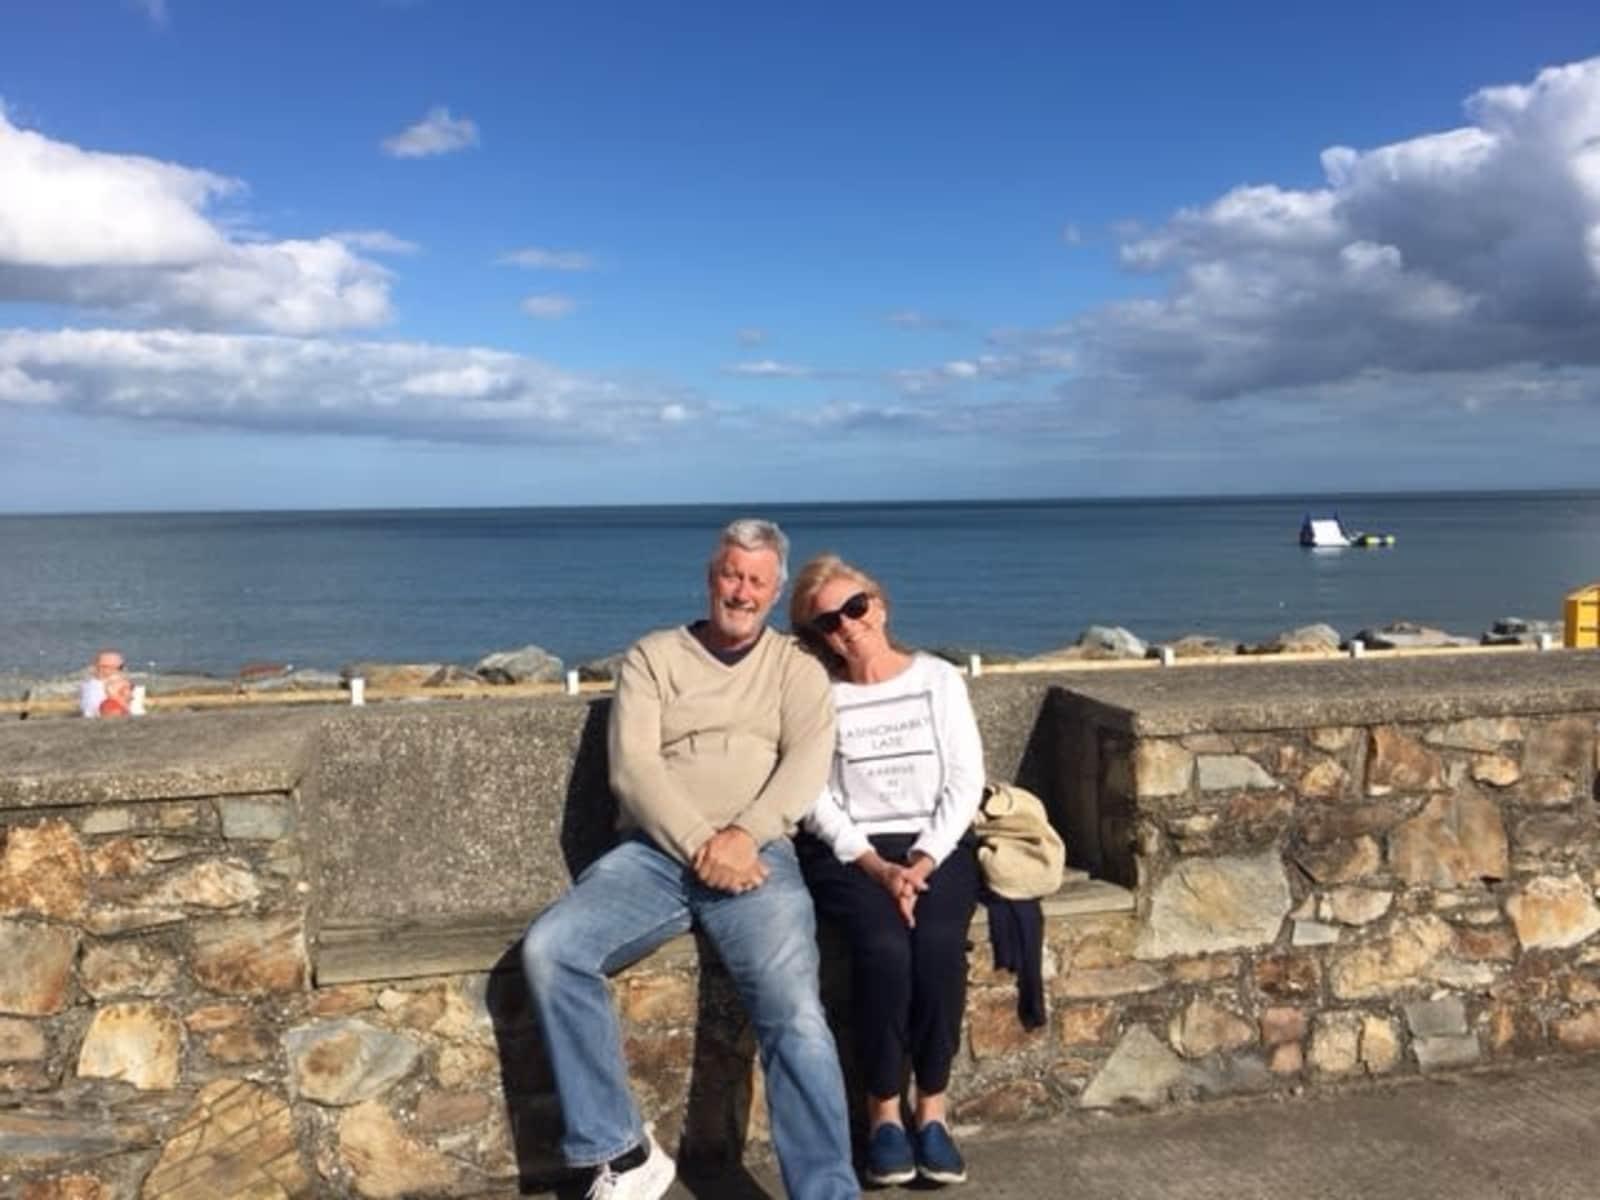 Sharon & Gary from Ocean Reef, Western Australia, Australia